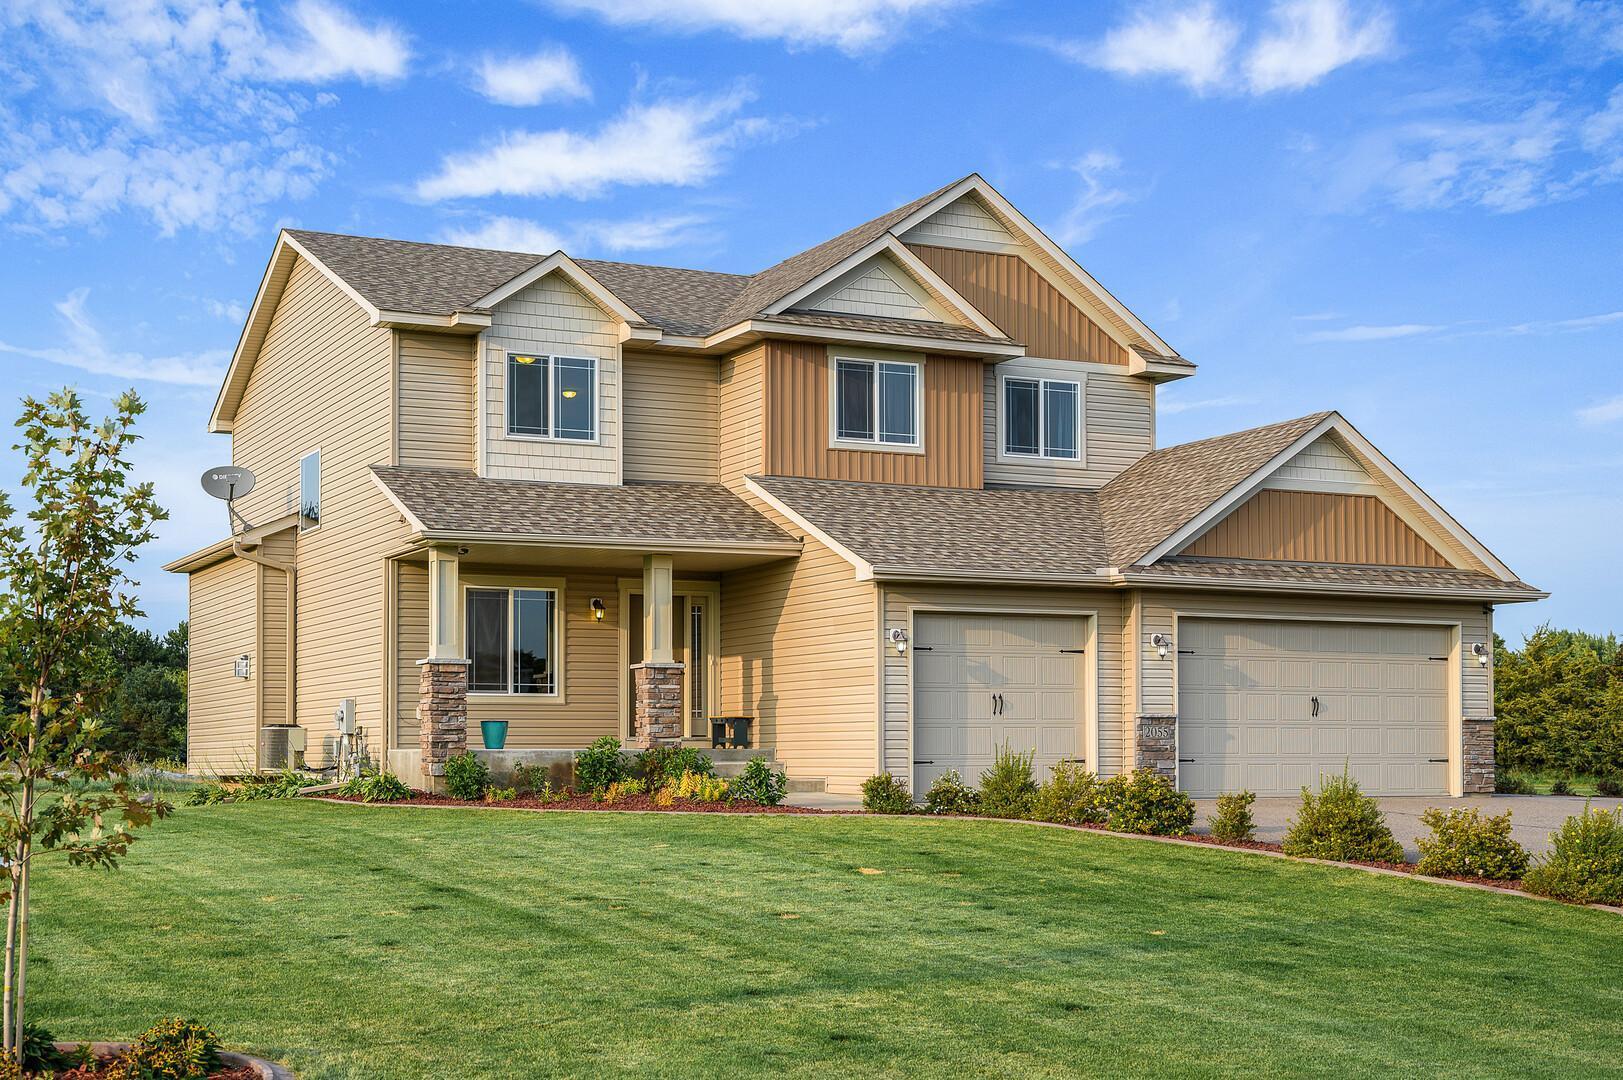 2055 133rd Lane NE Property Photo - Ham Lake, MN real estate listing